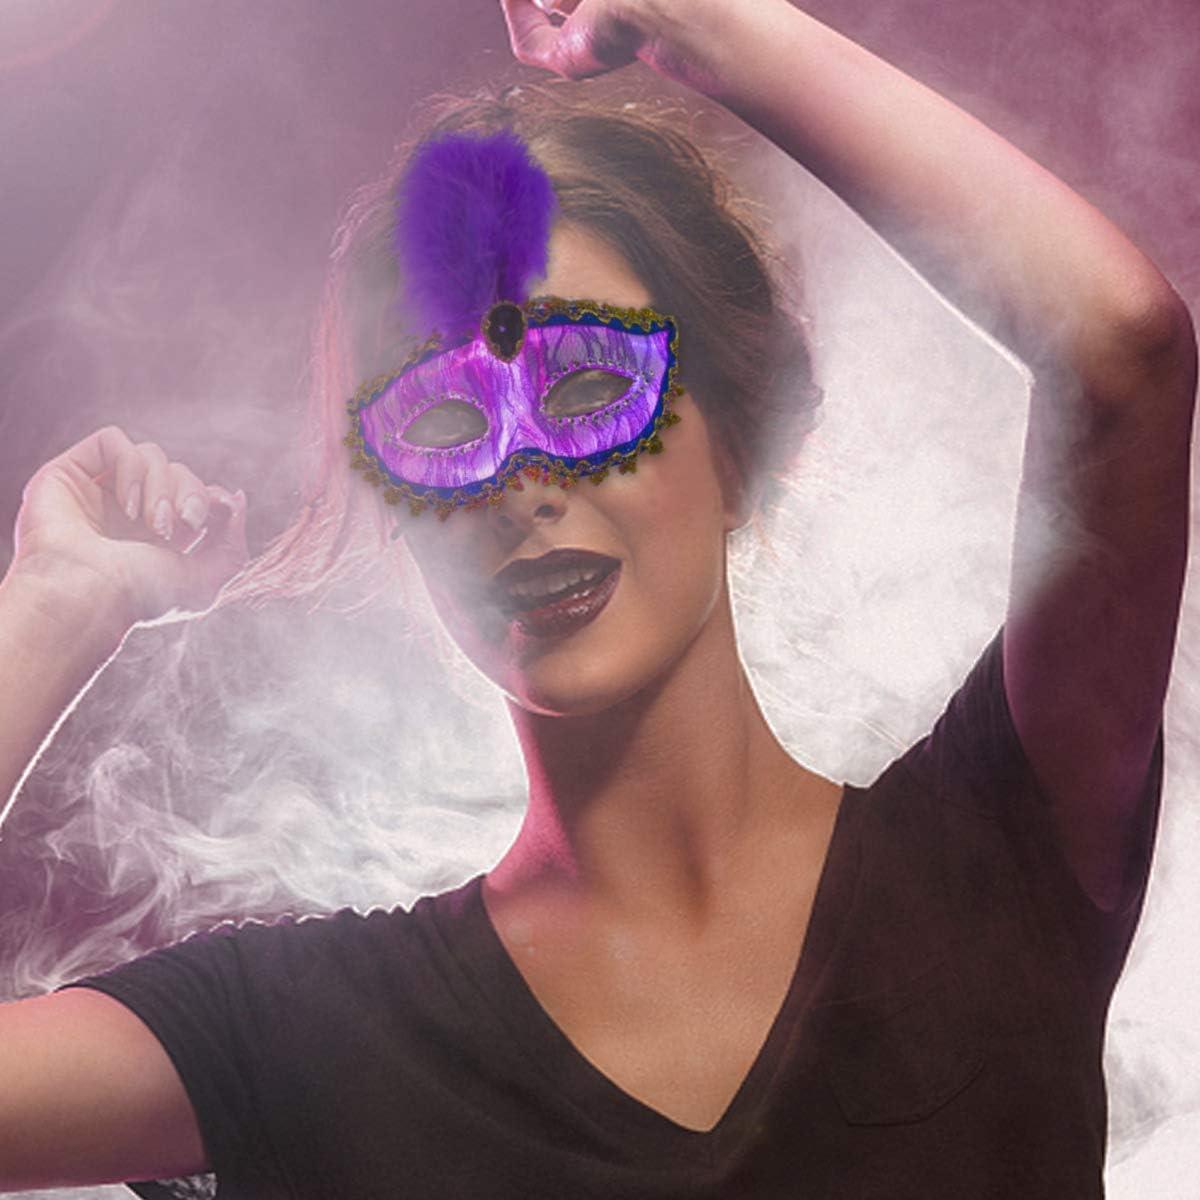 Fiber Optic Luminous Eye Mask USB Rechargeable with 7 Color Settings /& 4 Flashing Mode Optional Light Up Masquerade Mask LED Womens Costume Mask